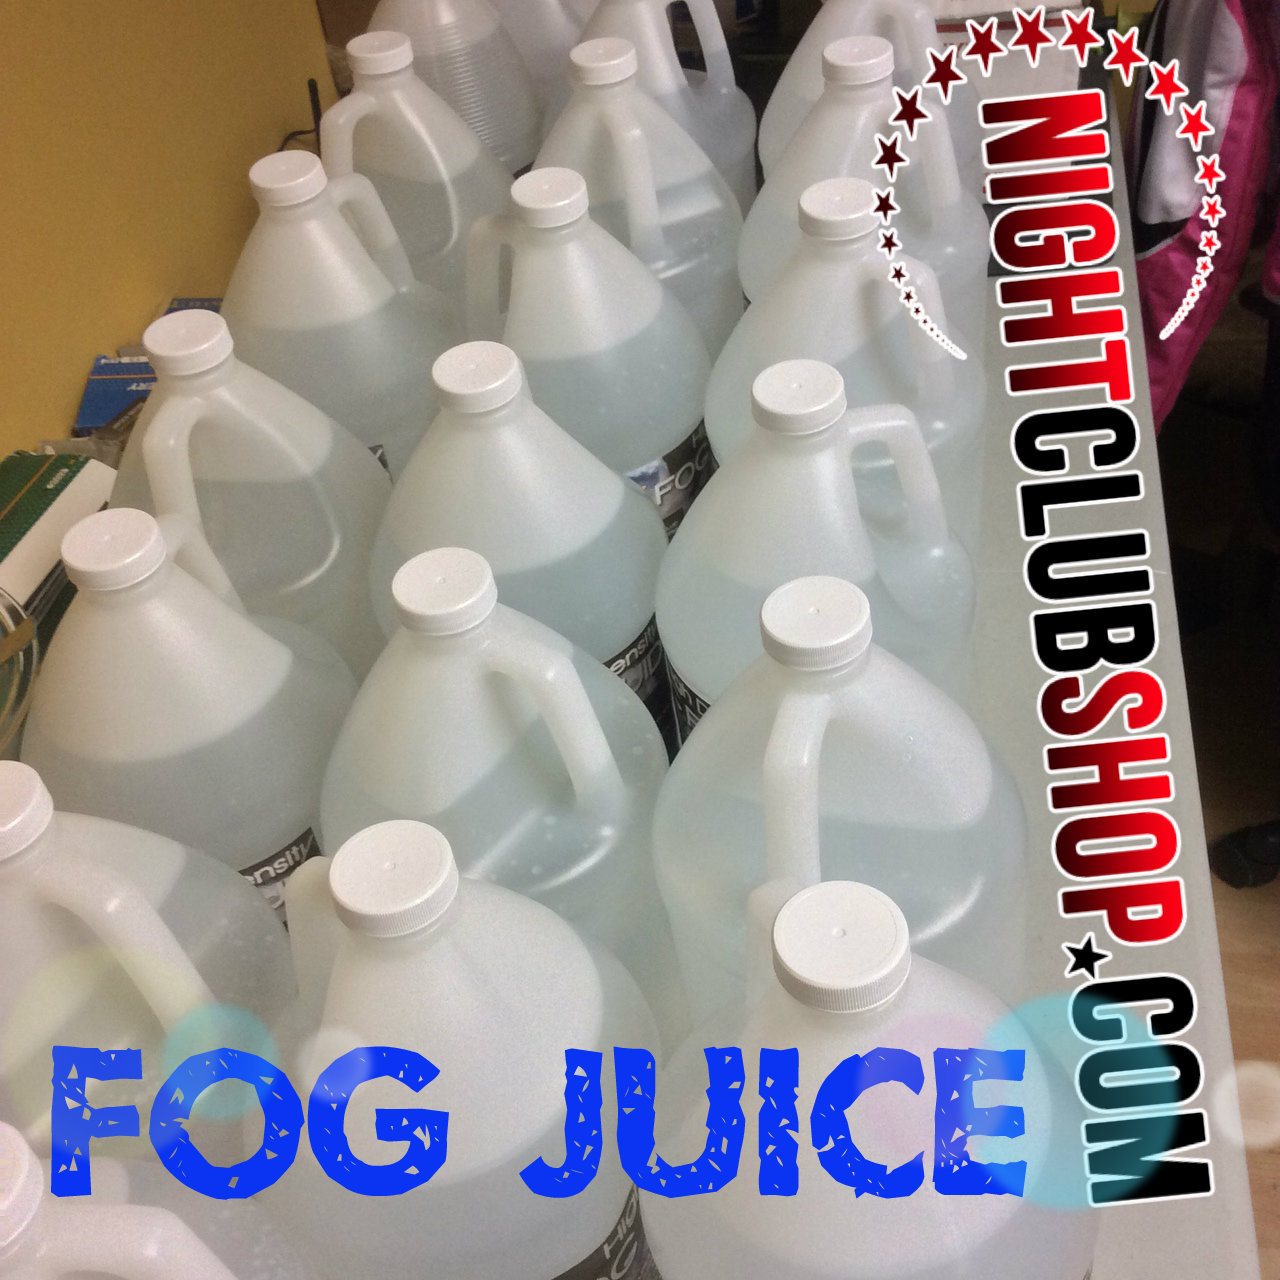 bubble-juice-fog-effect-liquid-1-gallon-container-refill-98810.1477114905.1280.1280.jpg